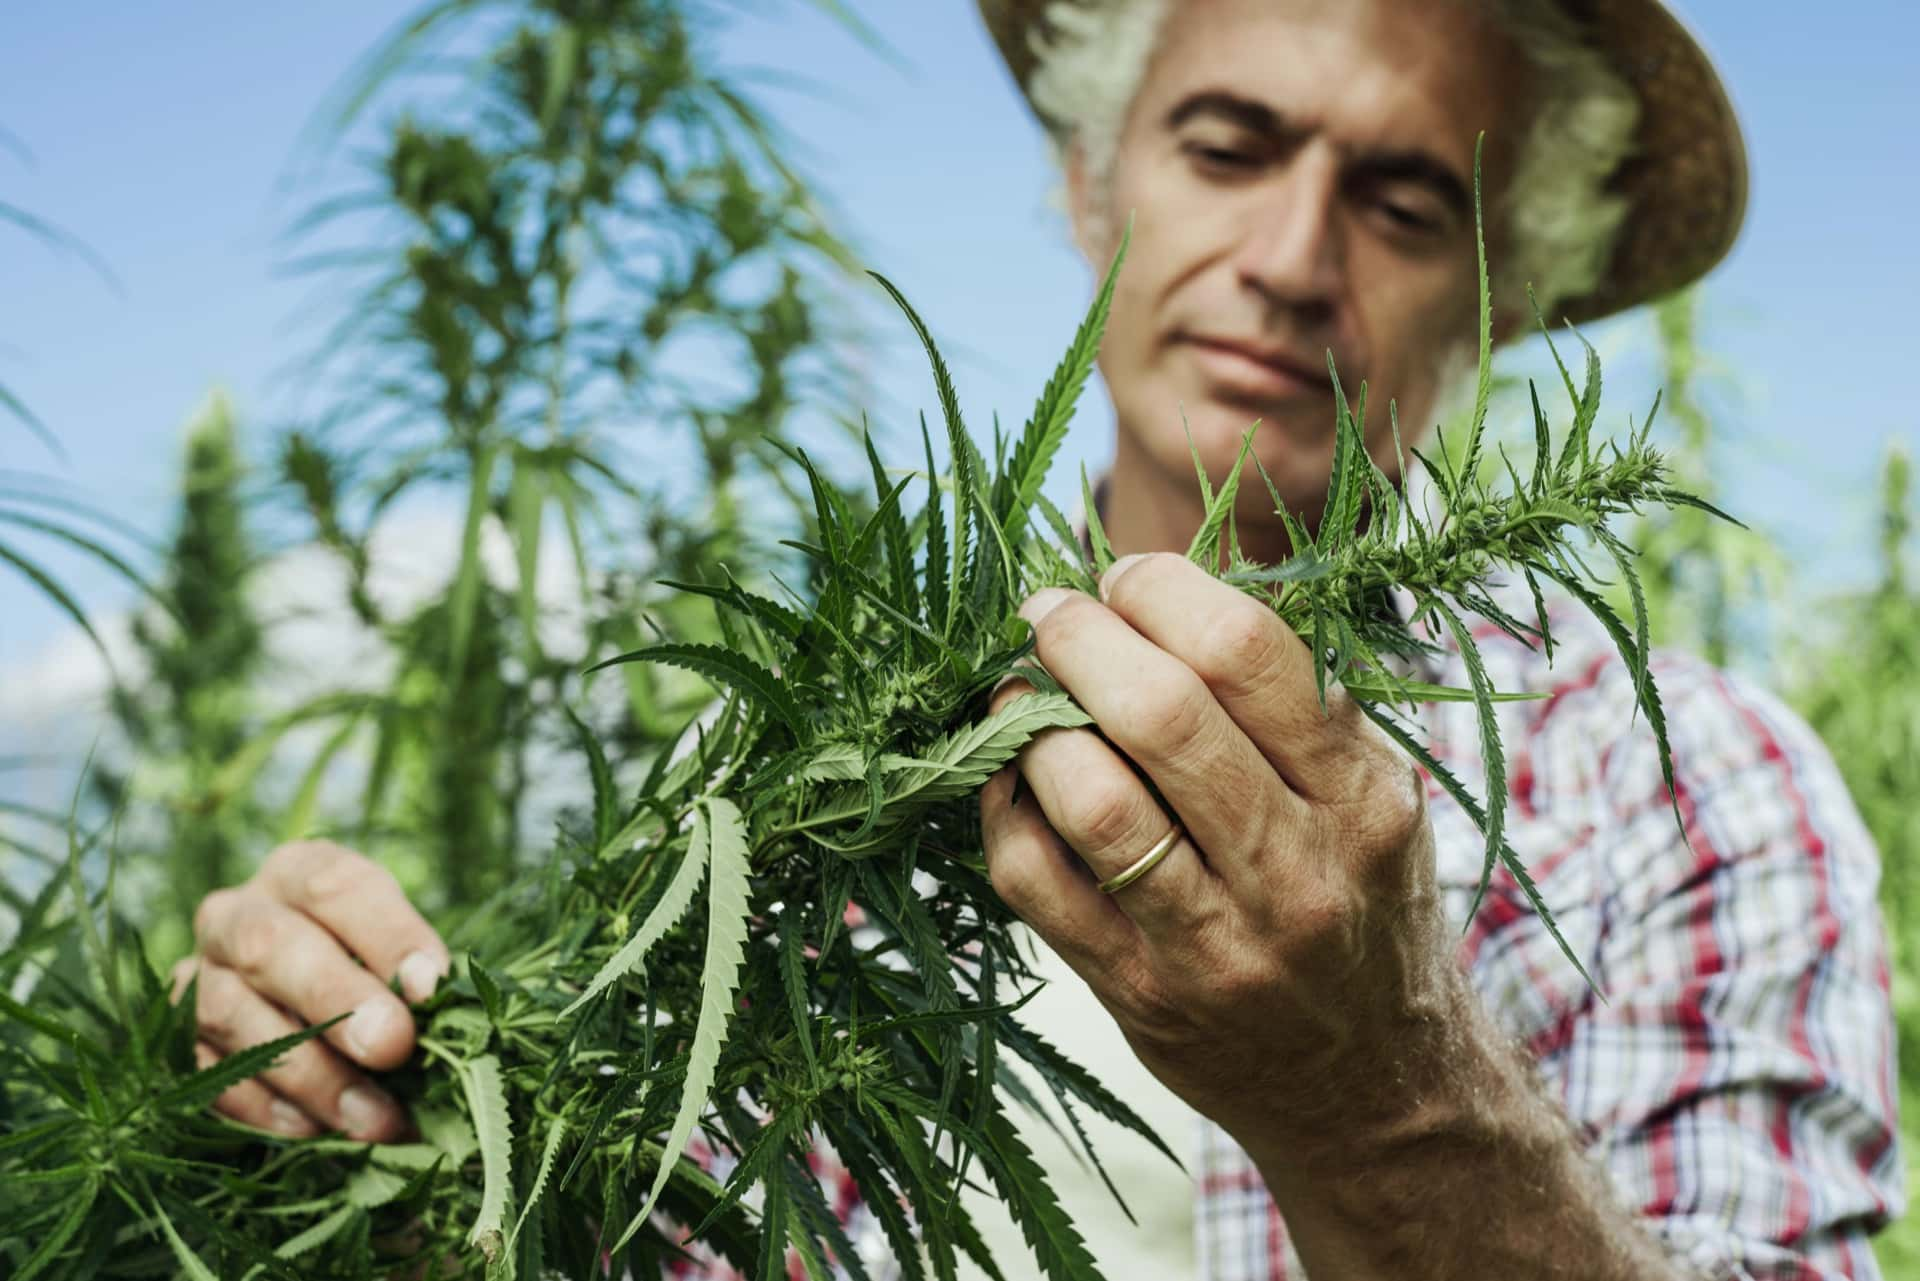 California Just Legalized Pot. What Happens Now?